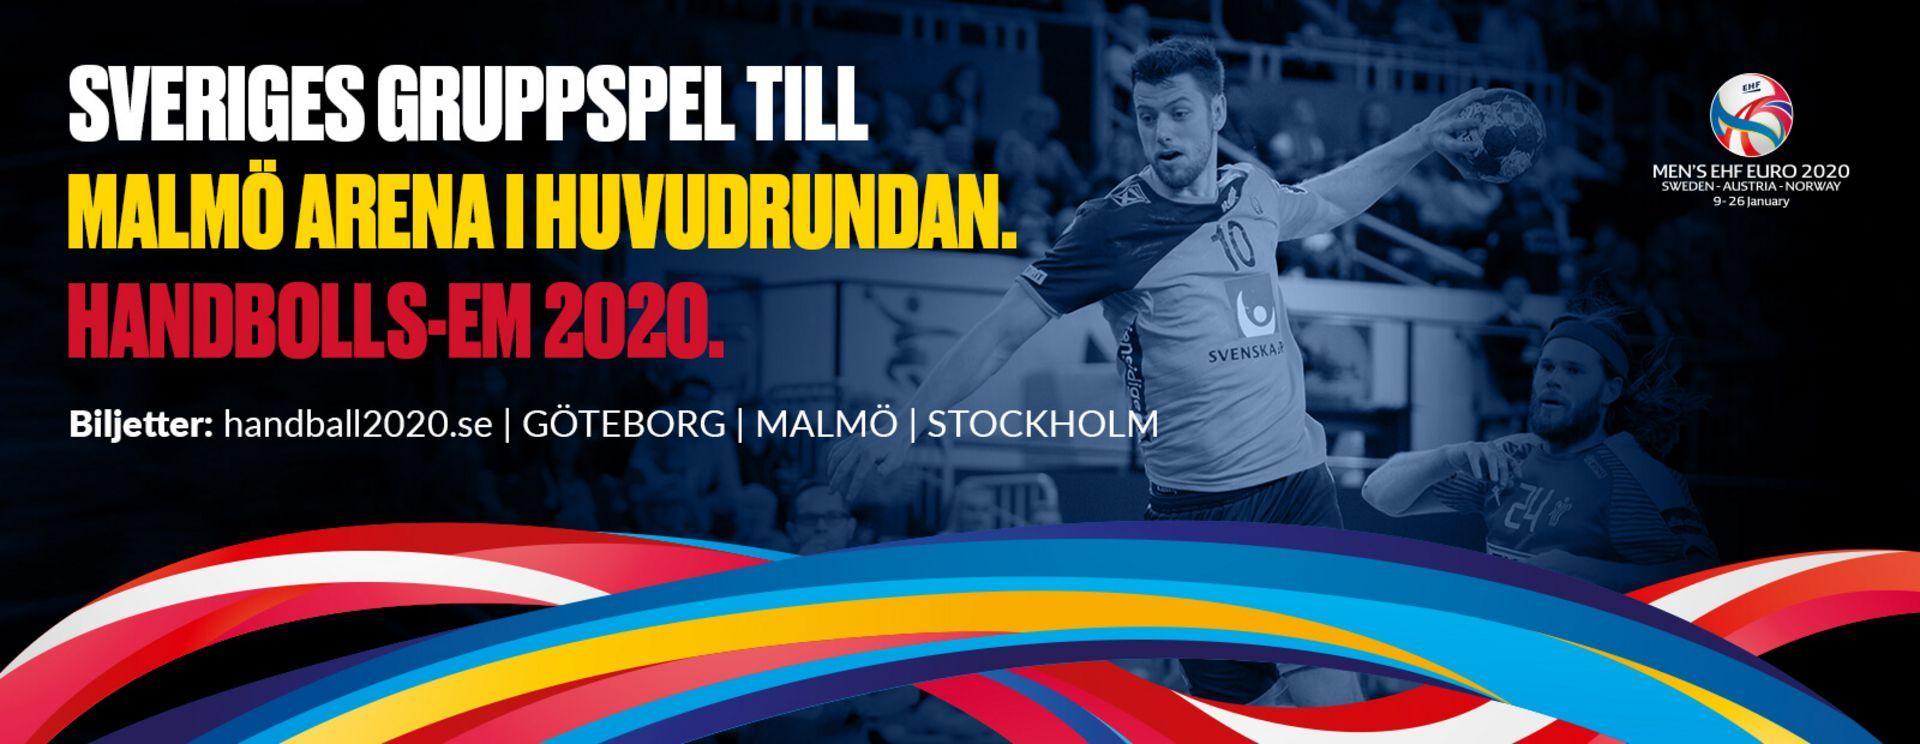 Euro Handball 2020 Malmo Arena